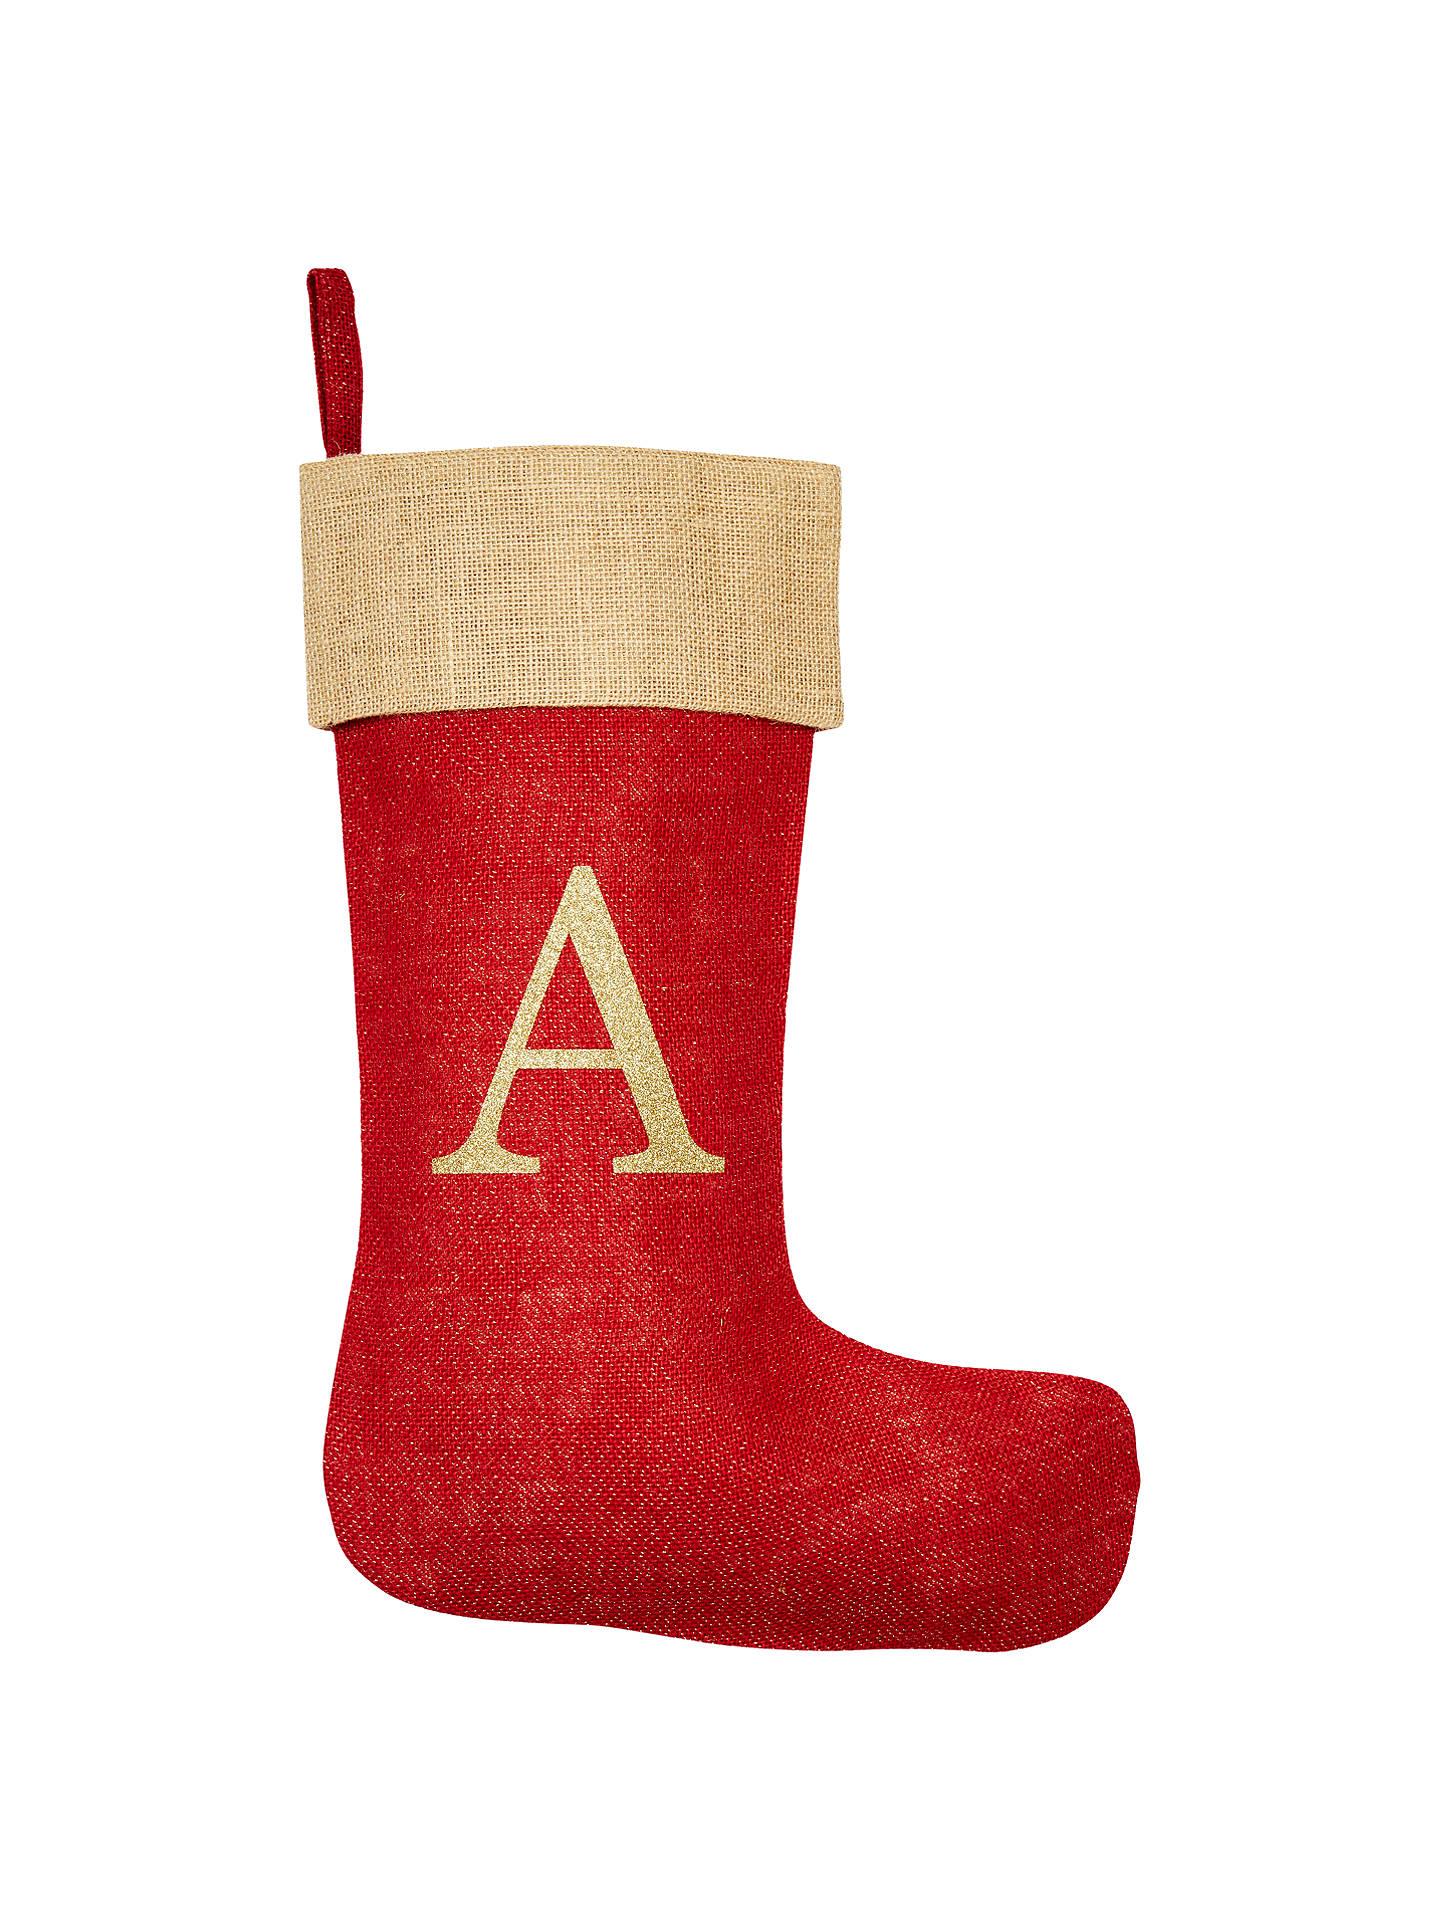 64bcc7e3c7dd Buy The Handmade Christmas Co. Personalised Christmas Stocking